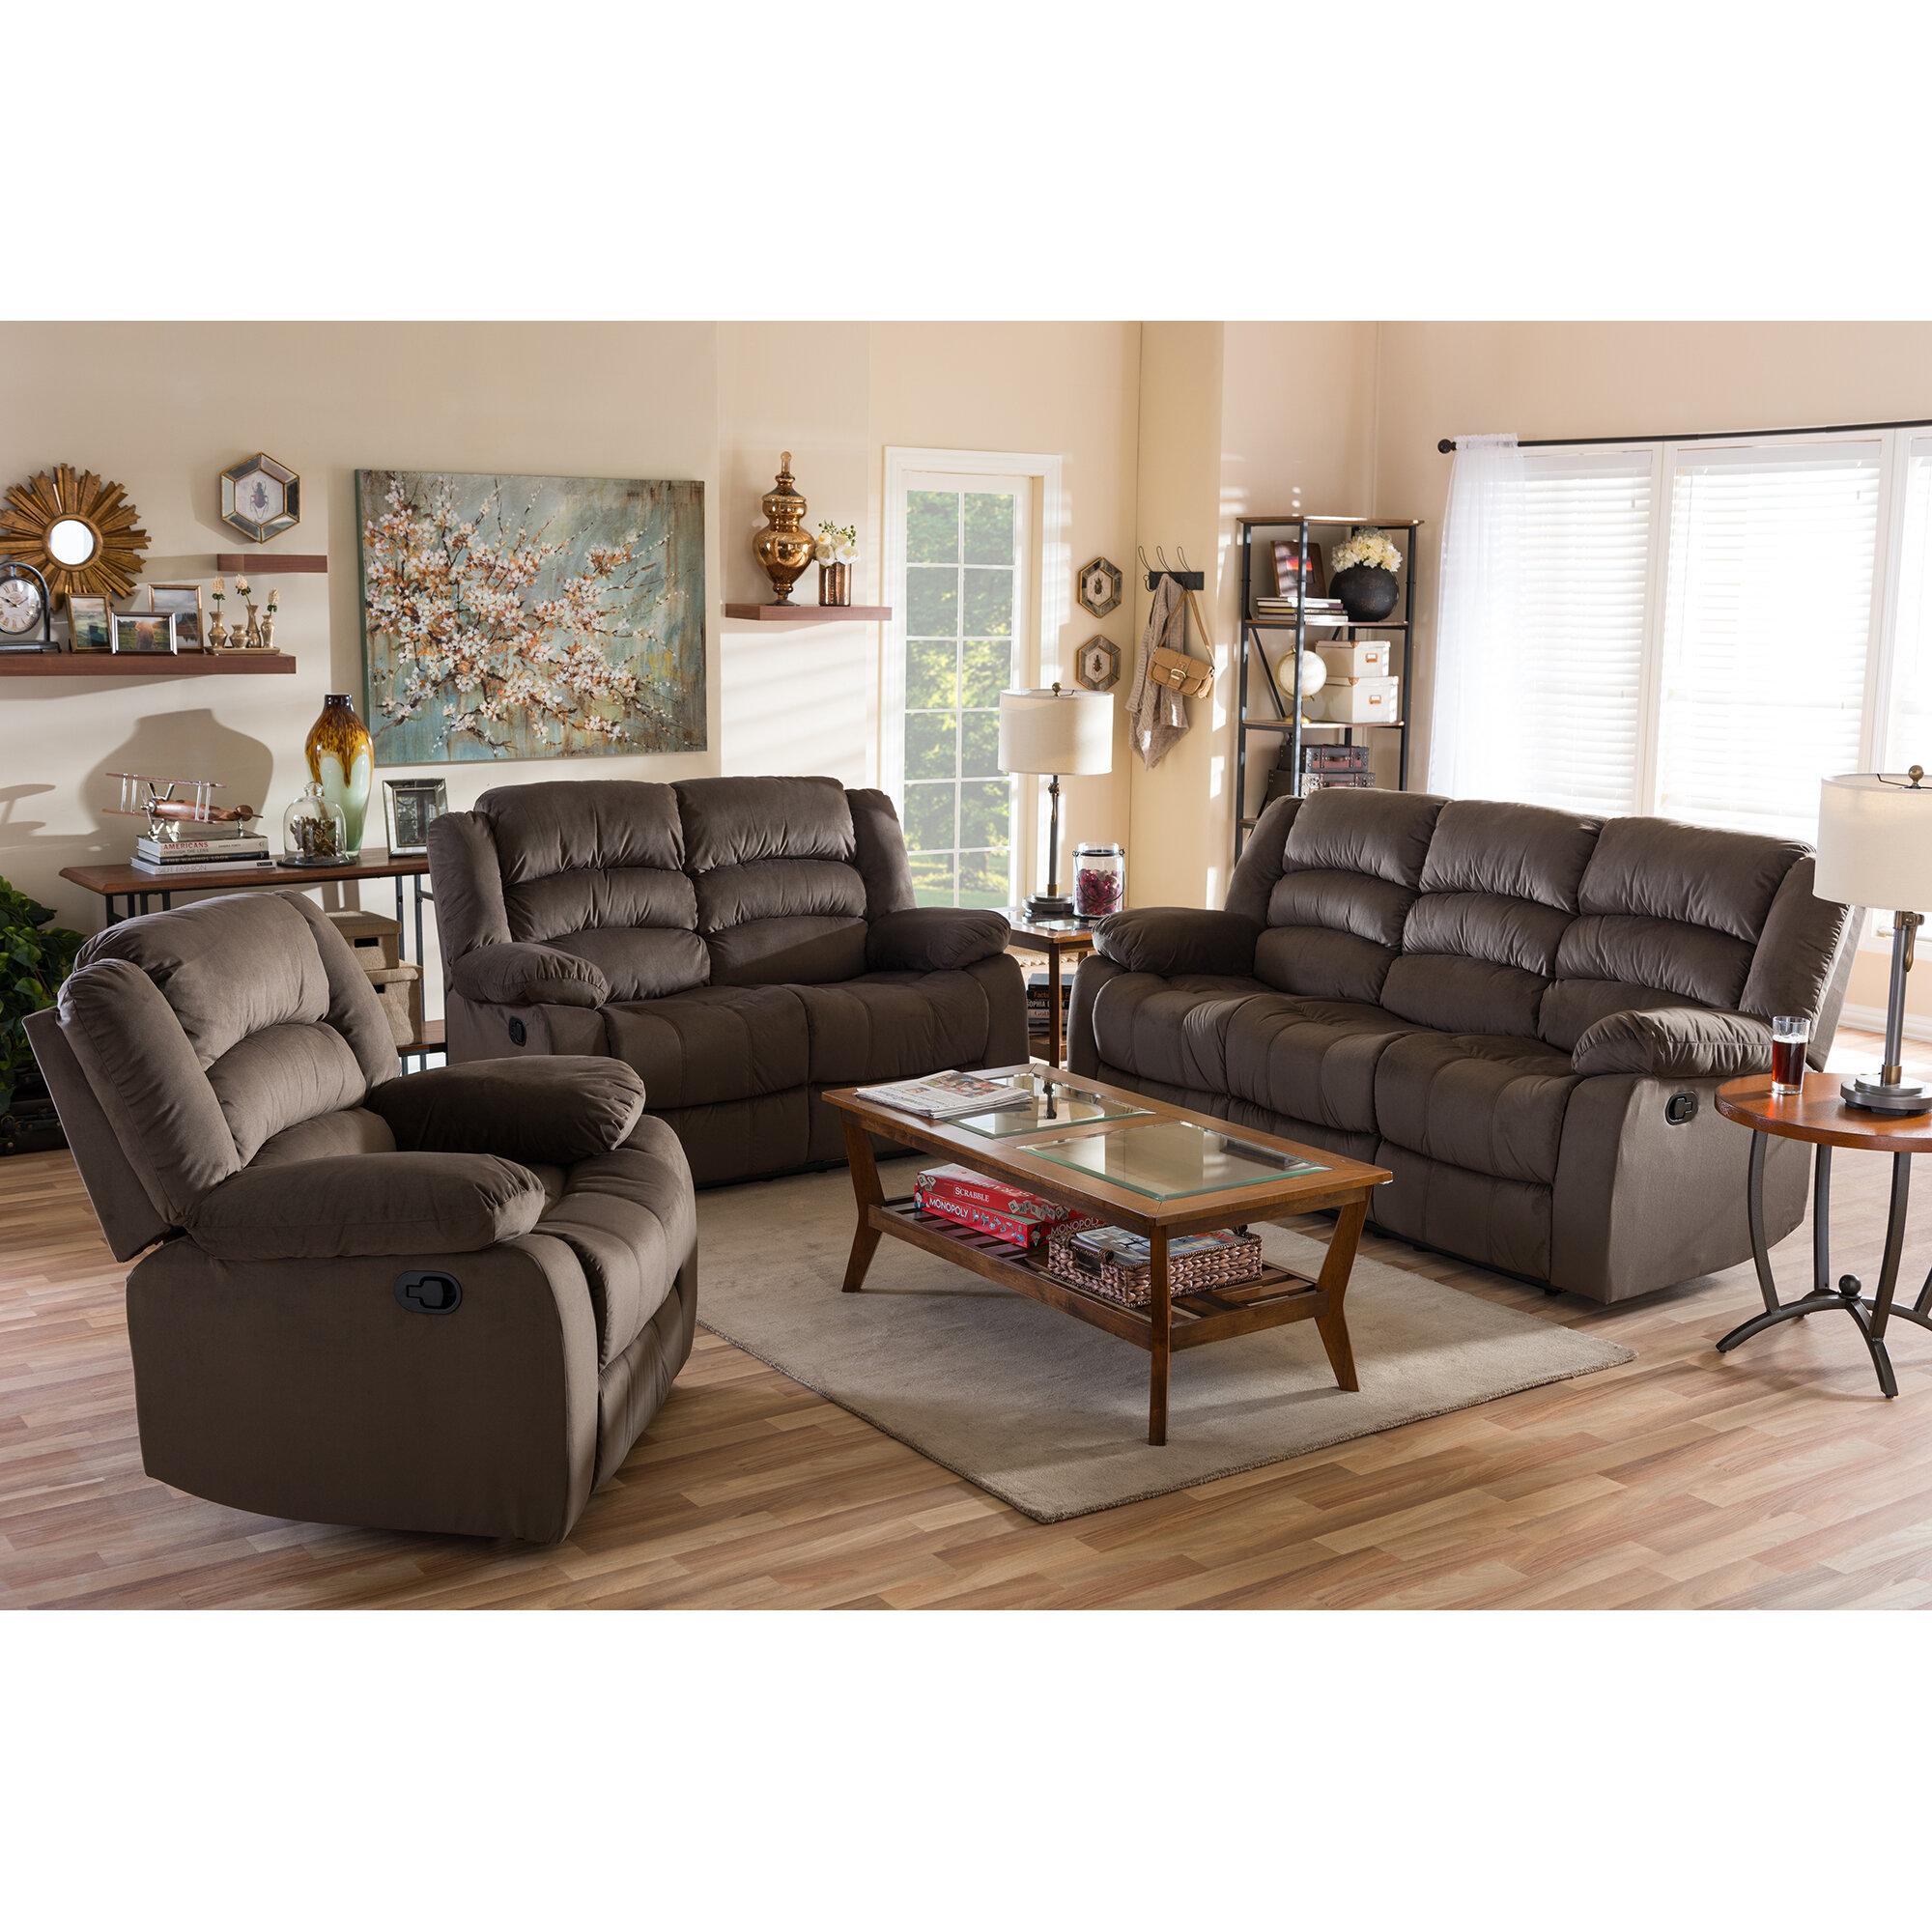 haverville 3 piece reclining living room set